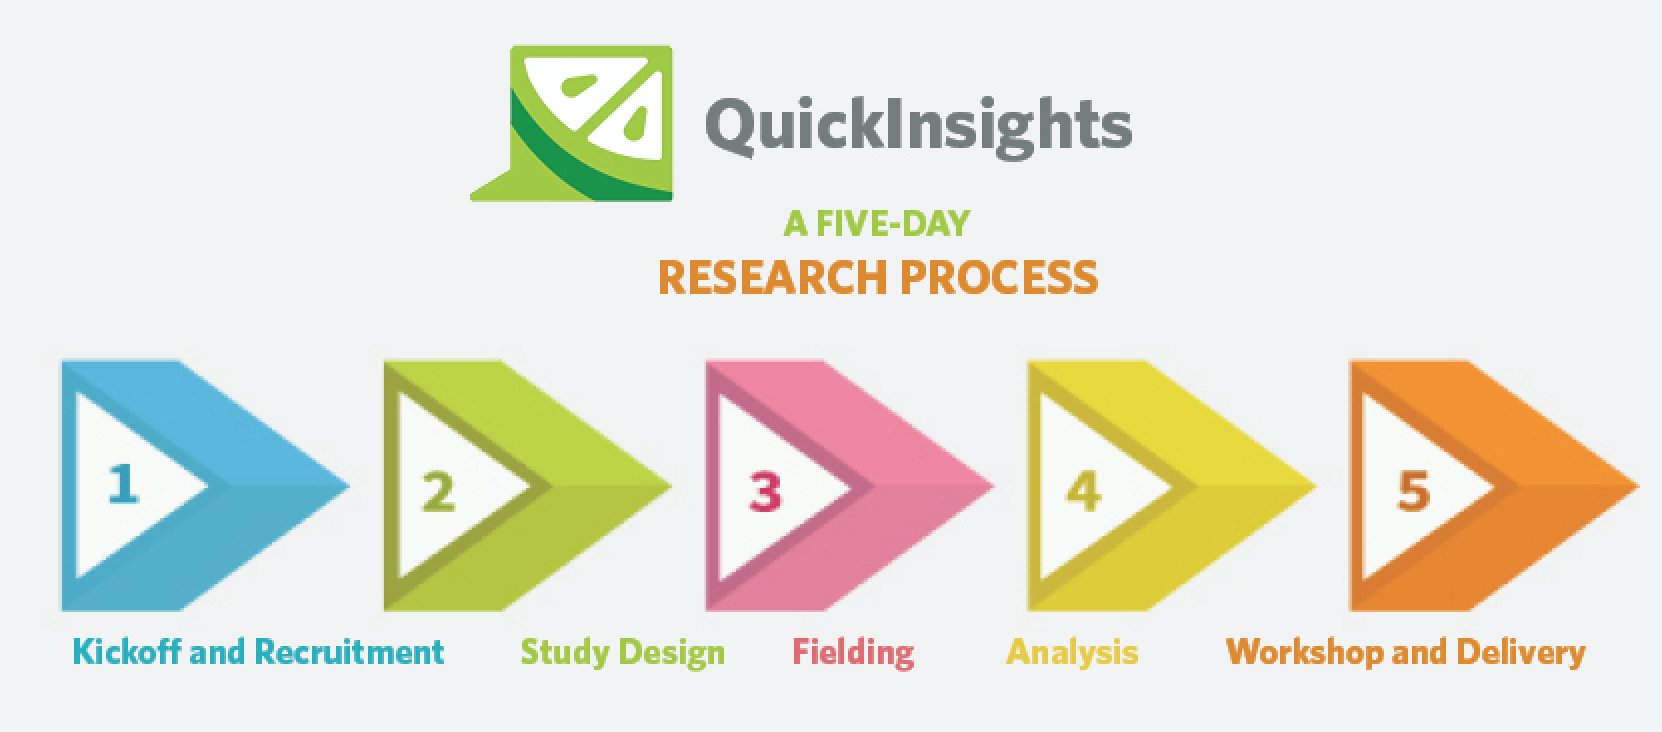 Quick Insights process